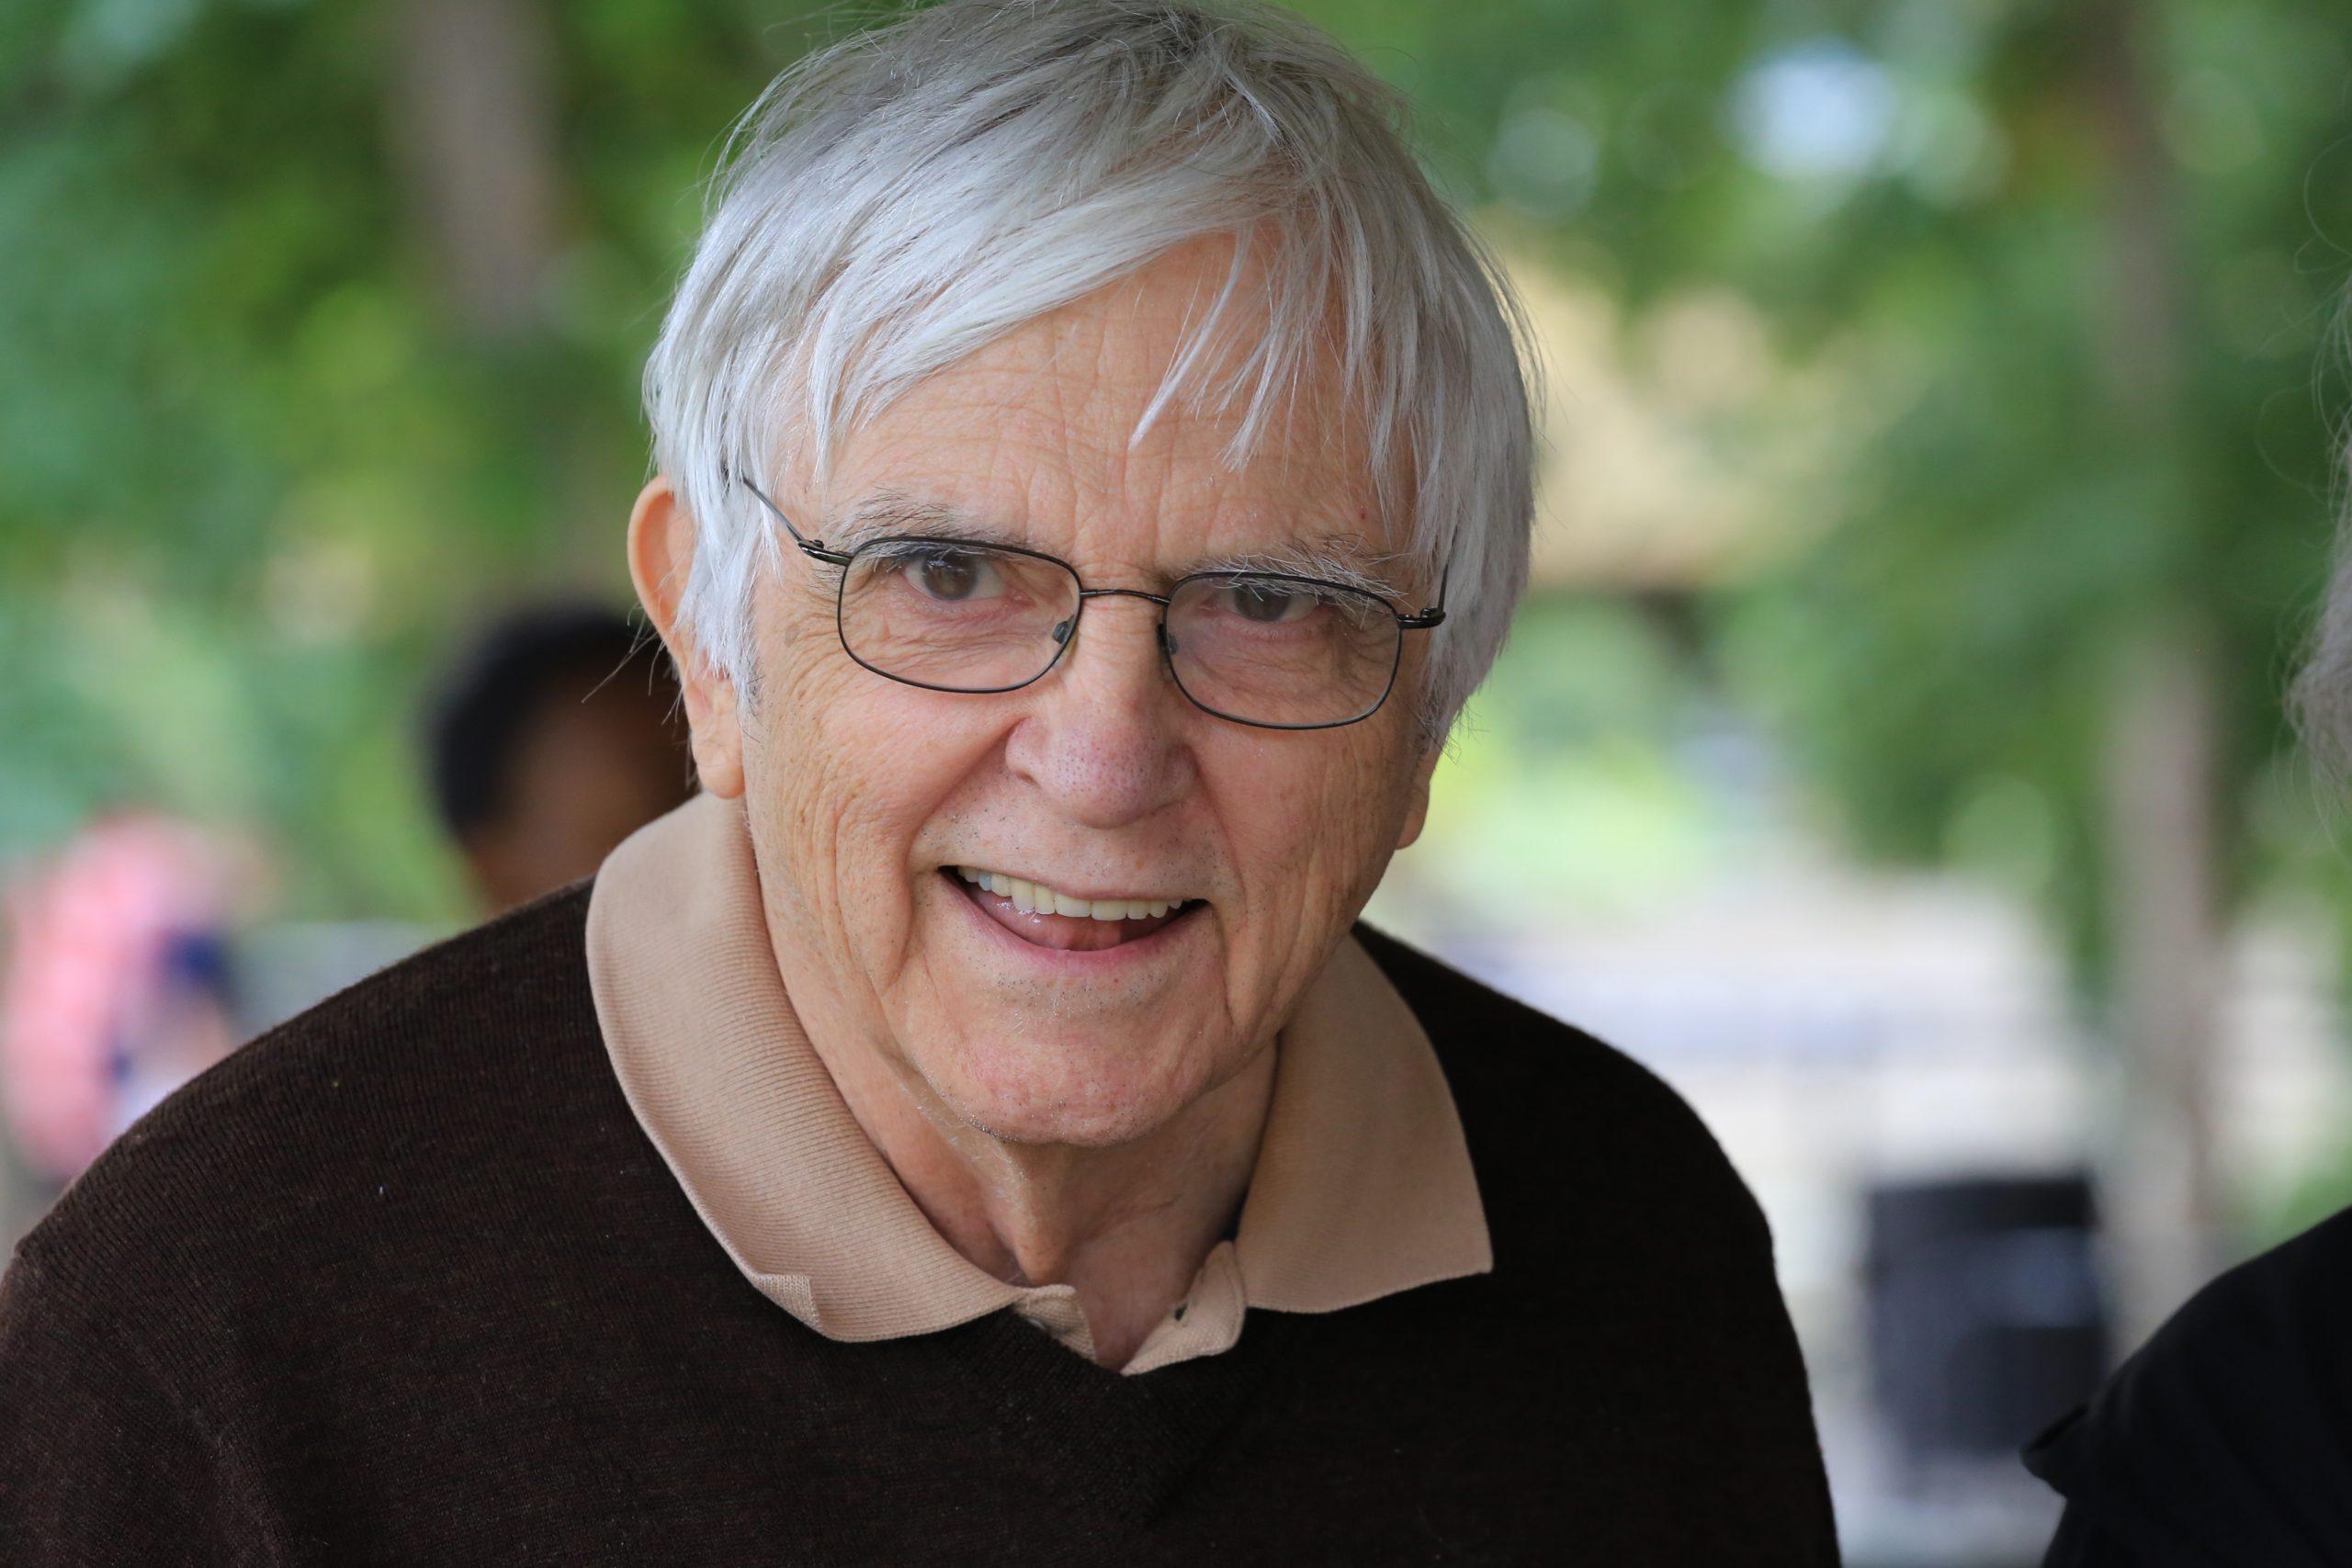 Stu Webb